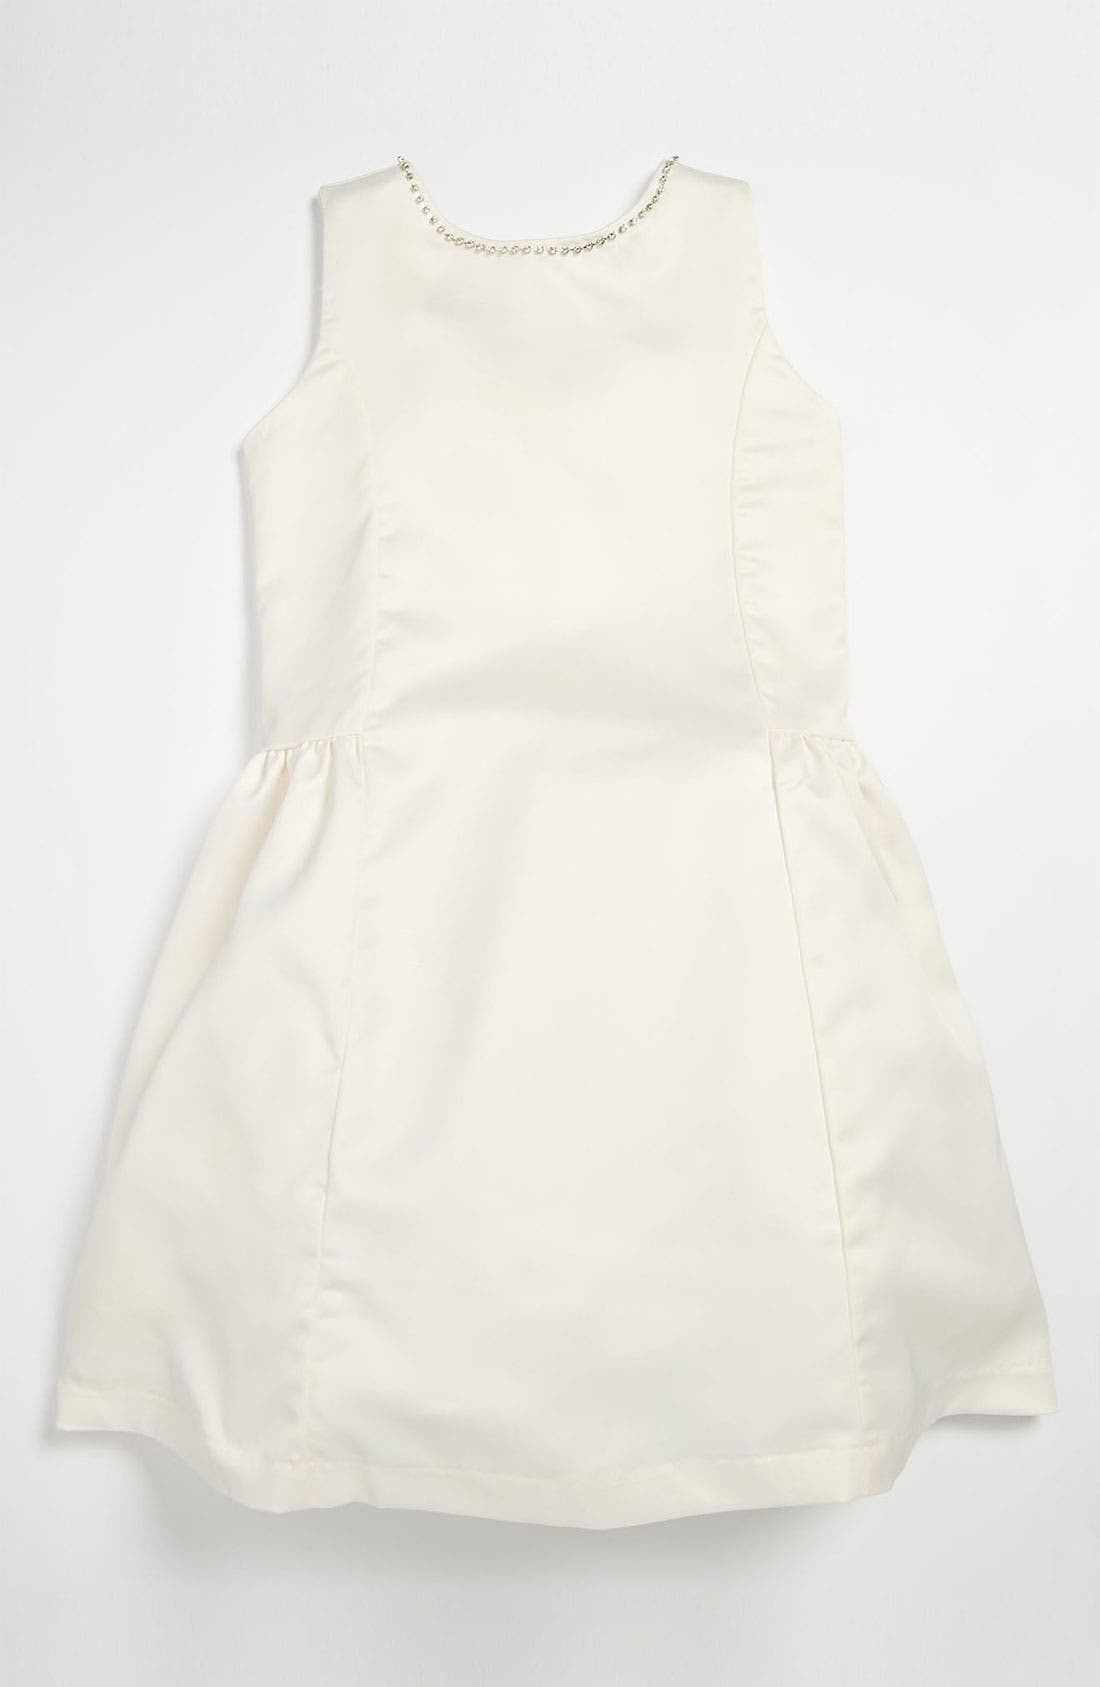 Main Image - La Piccola Danza Kidswear Bow Back Dress (Little Girls & Big Girls)